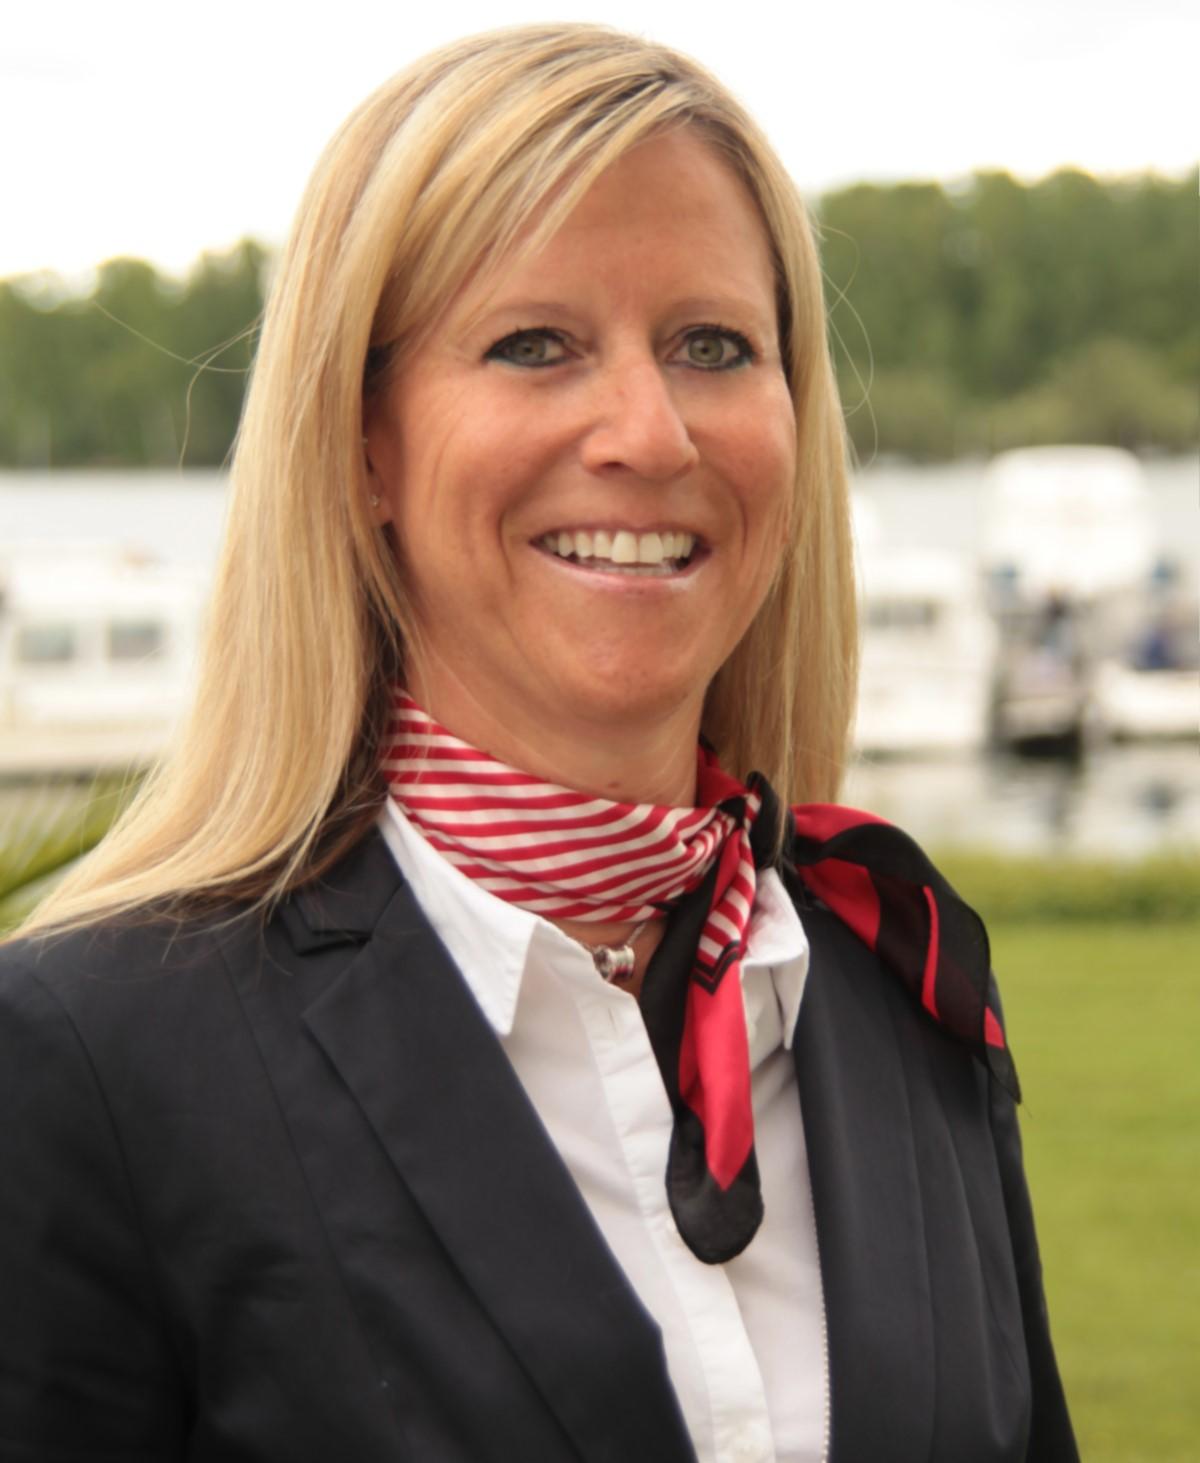 Nicole Höch